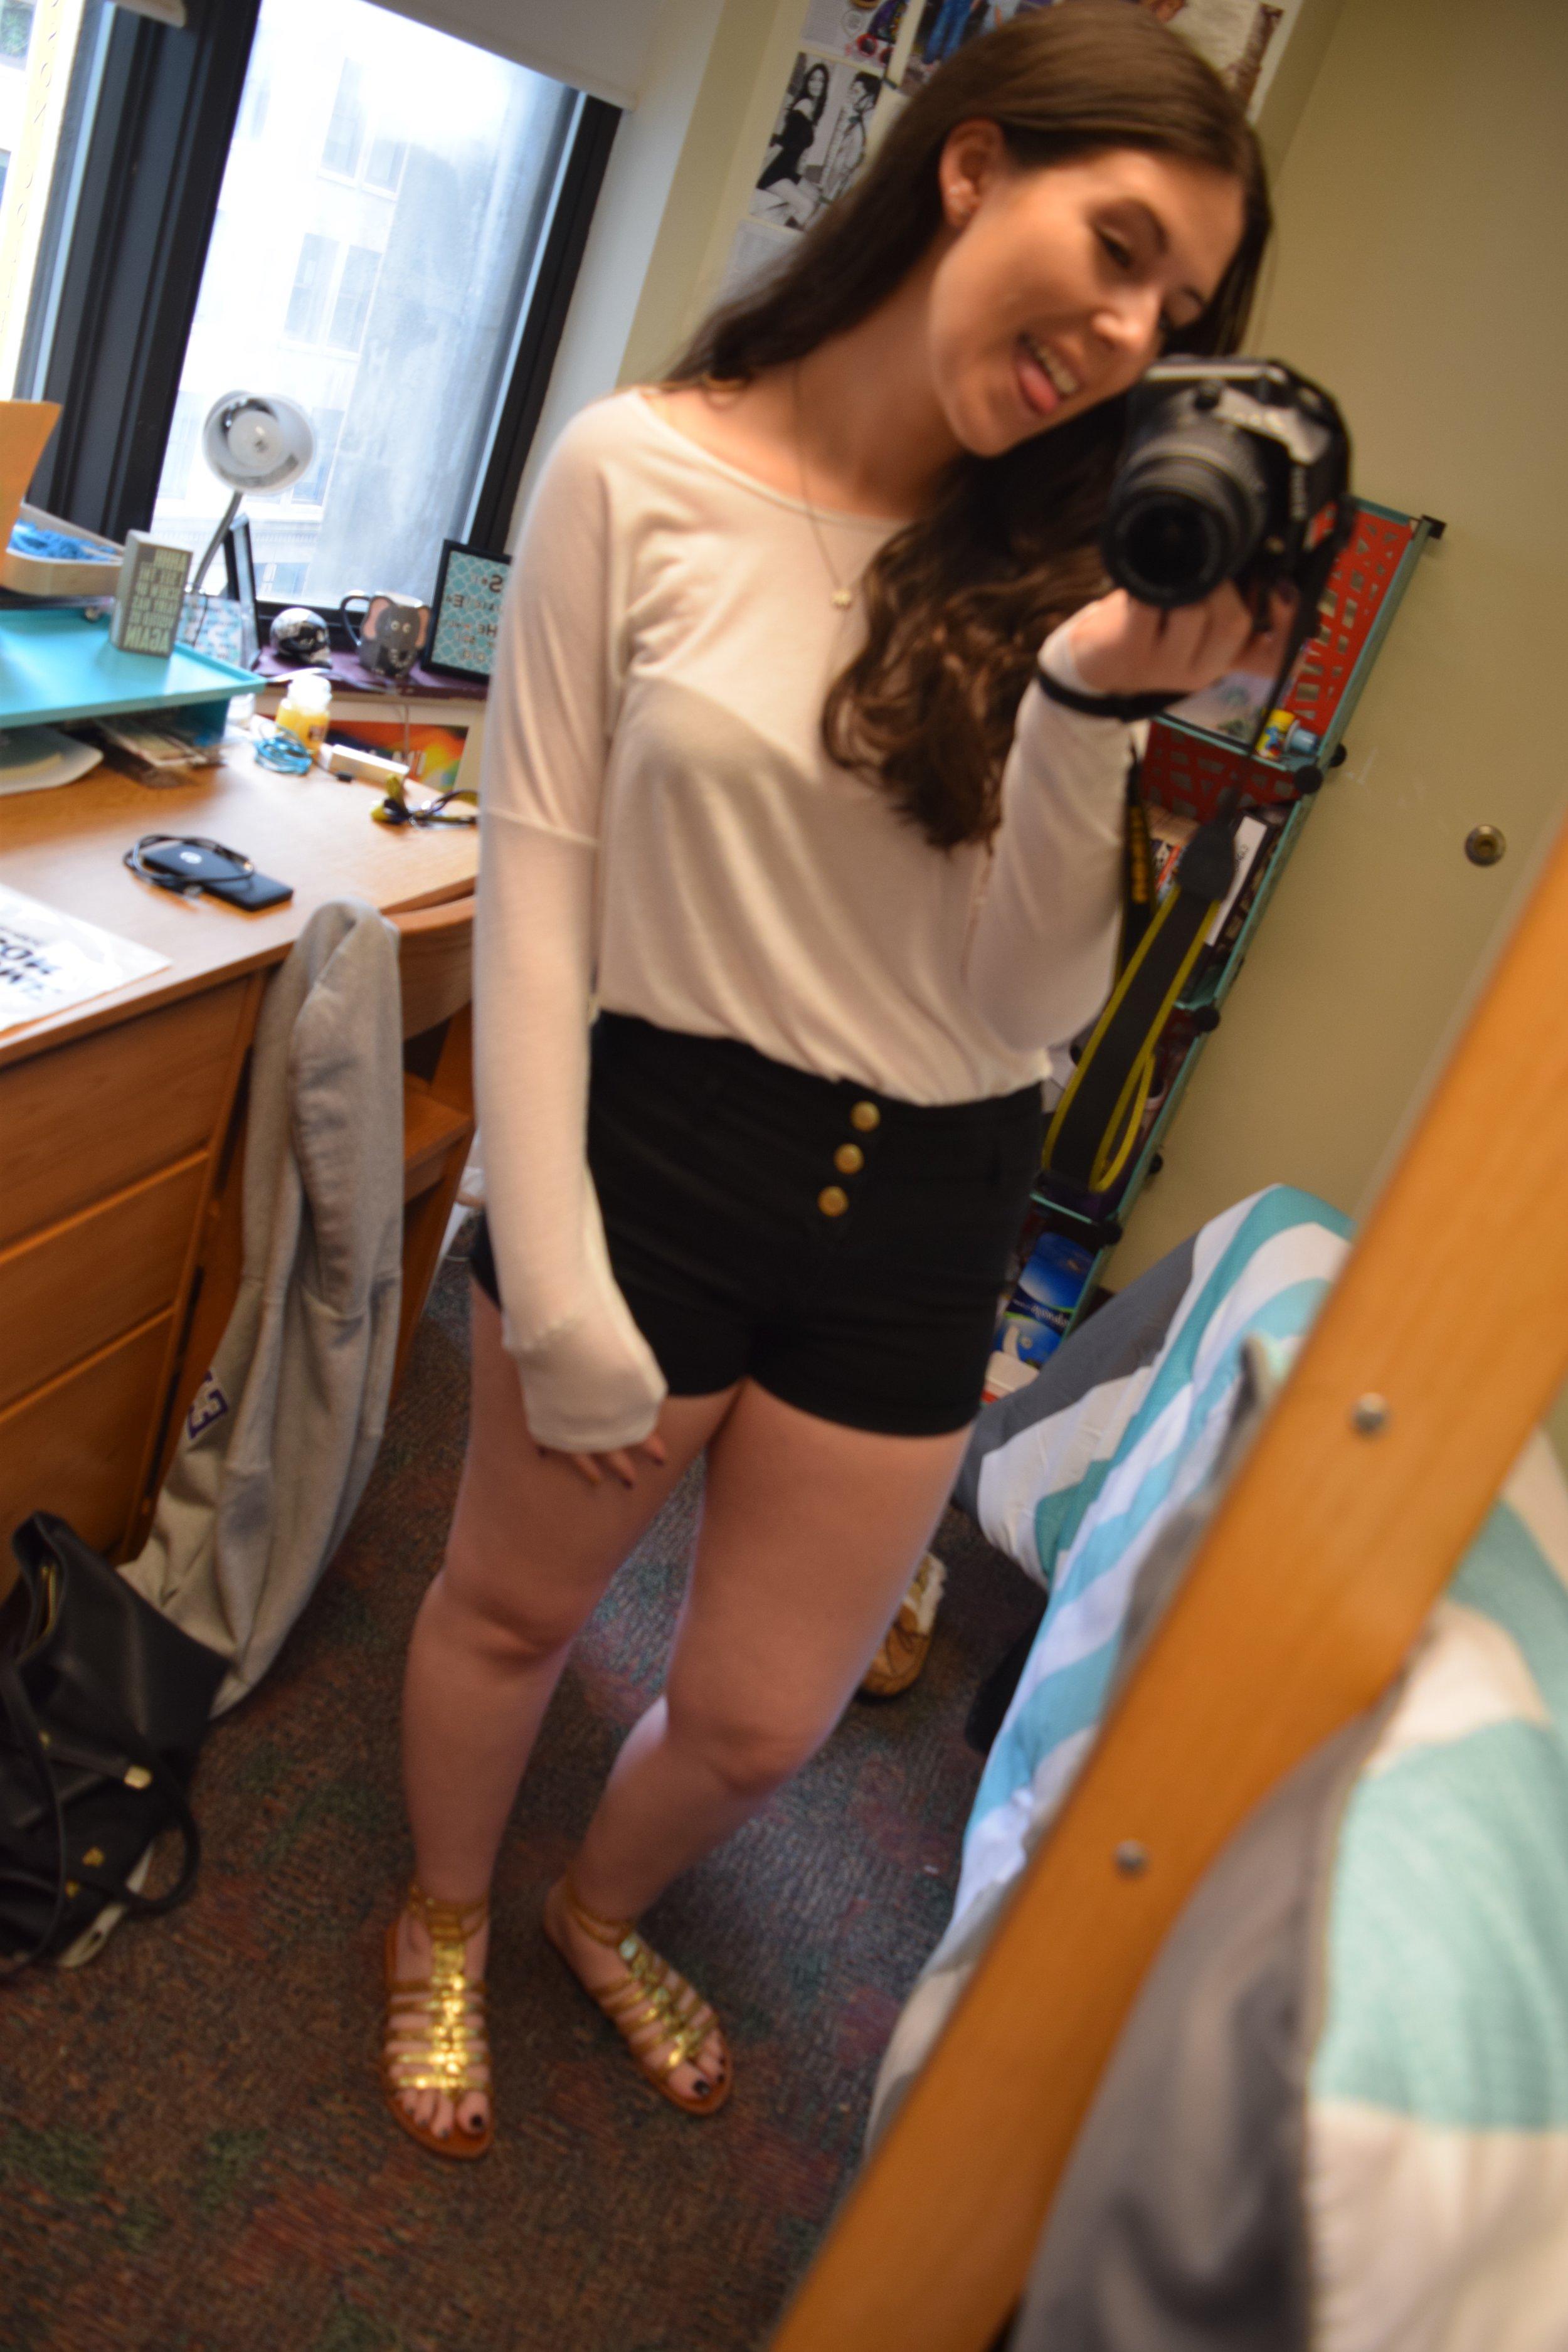 My name's Blurryface